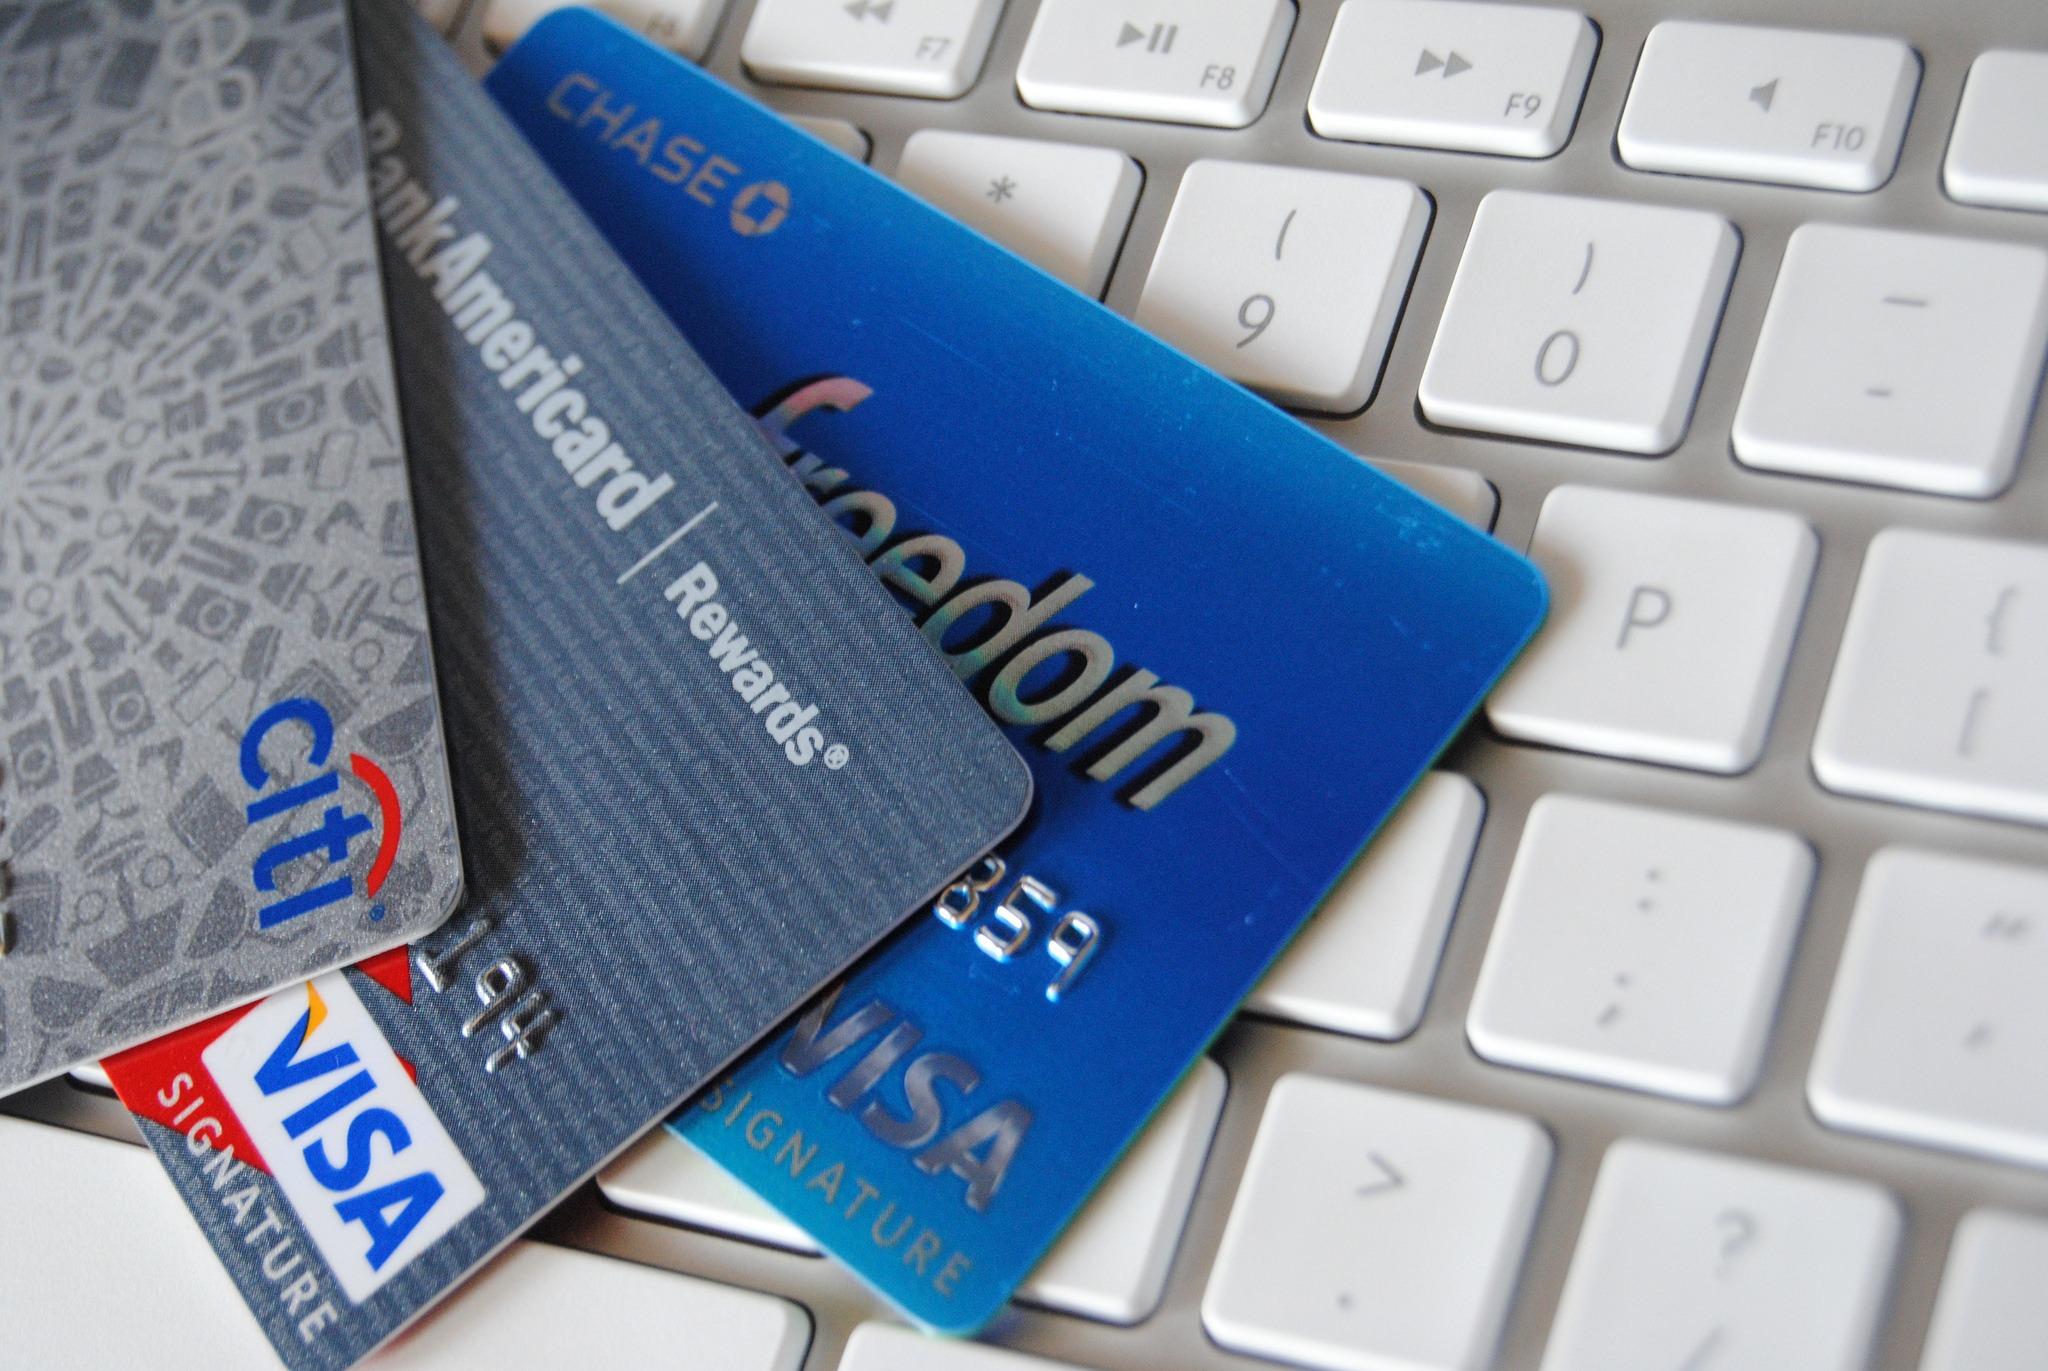 [cml_media_alt id='5980']dove cambiare i soldi - Credits gotcredit.com[/cml_media_alt]